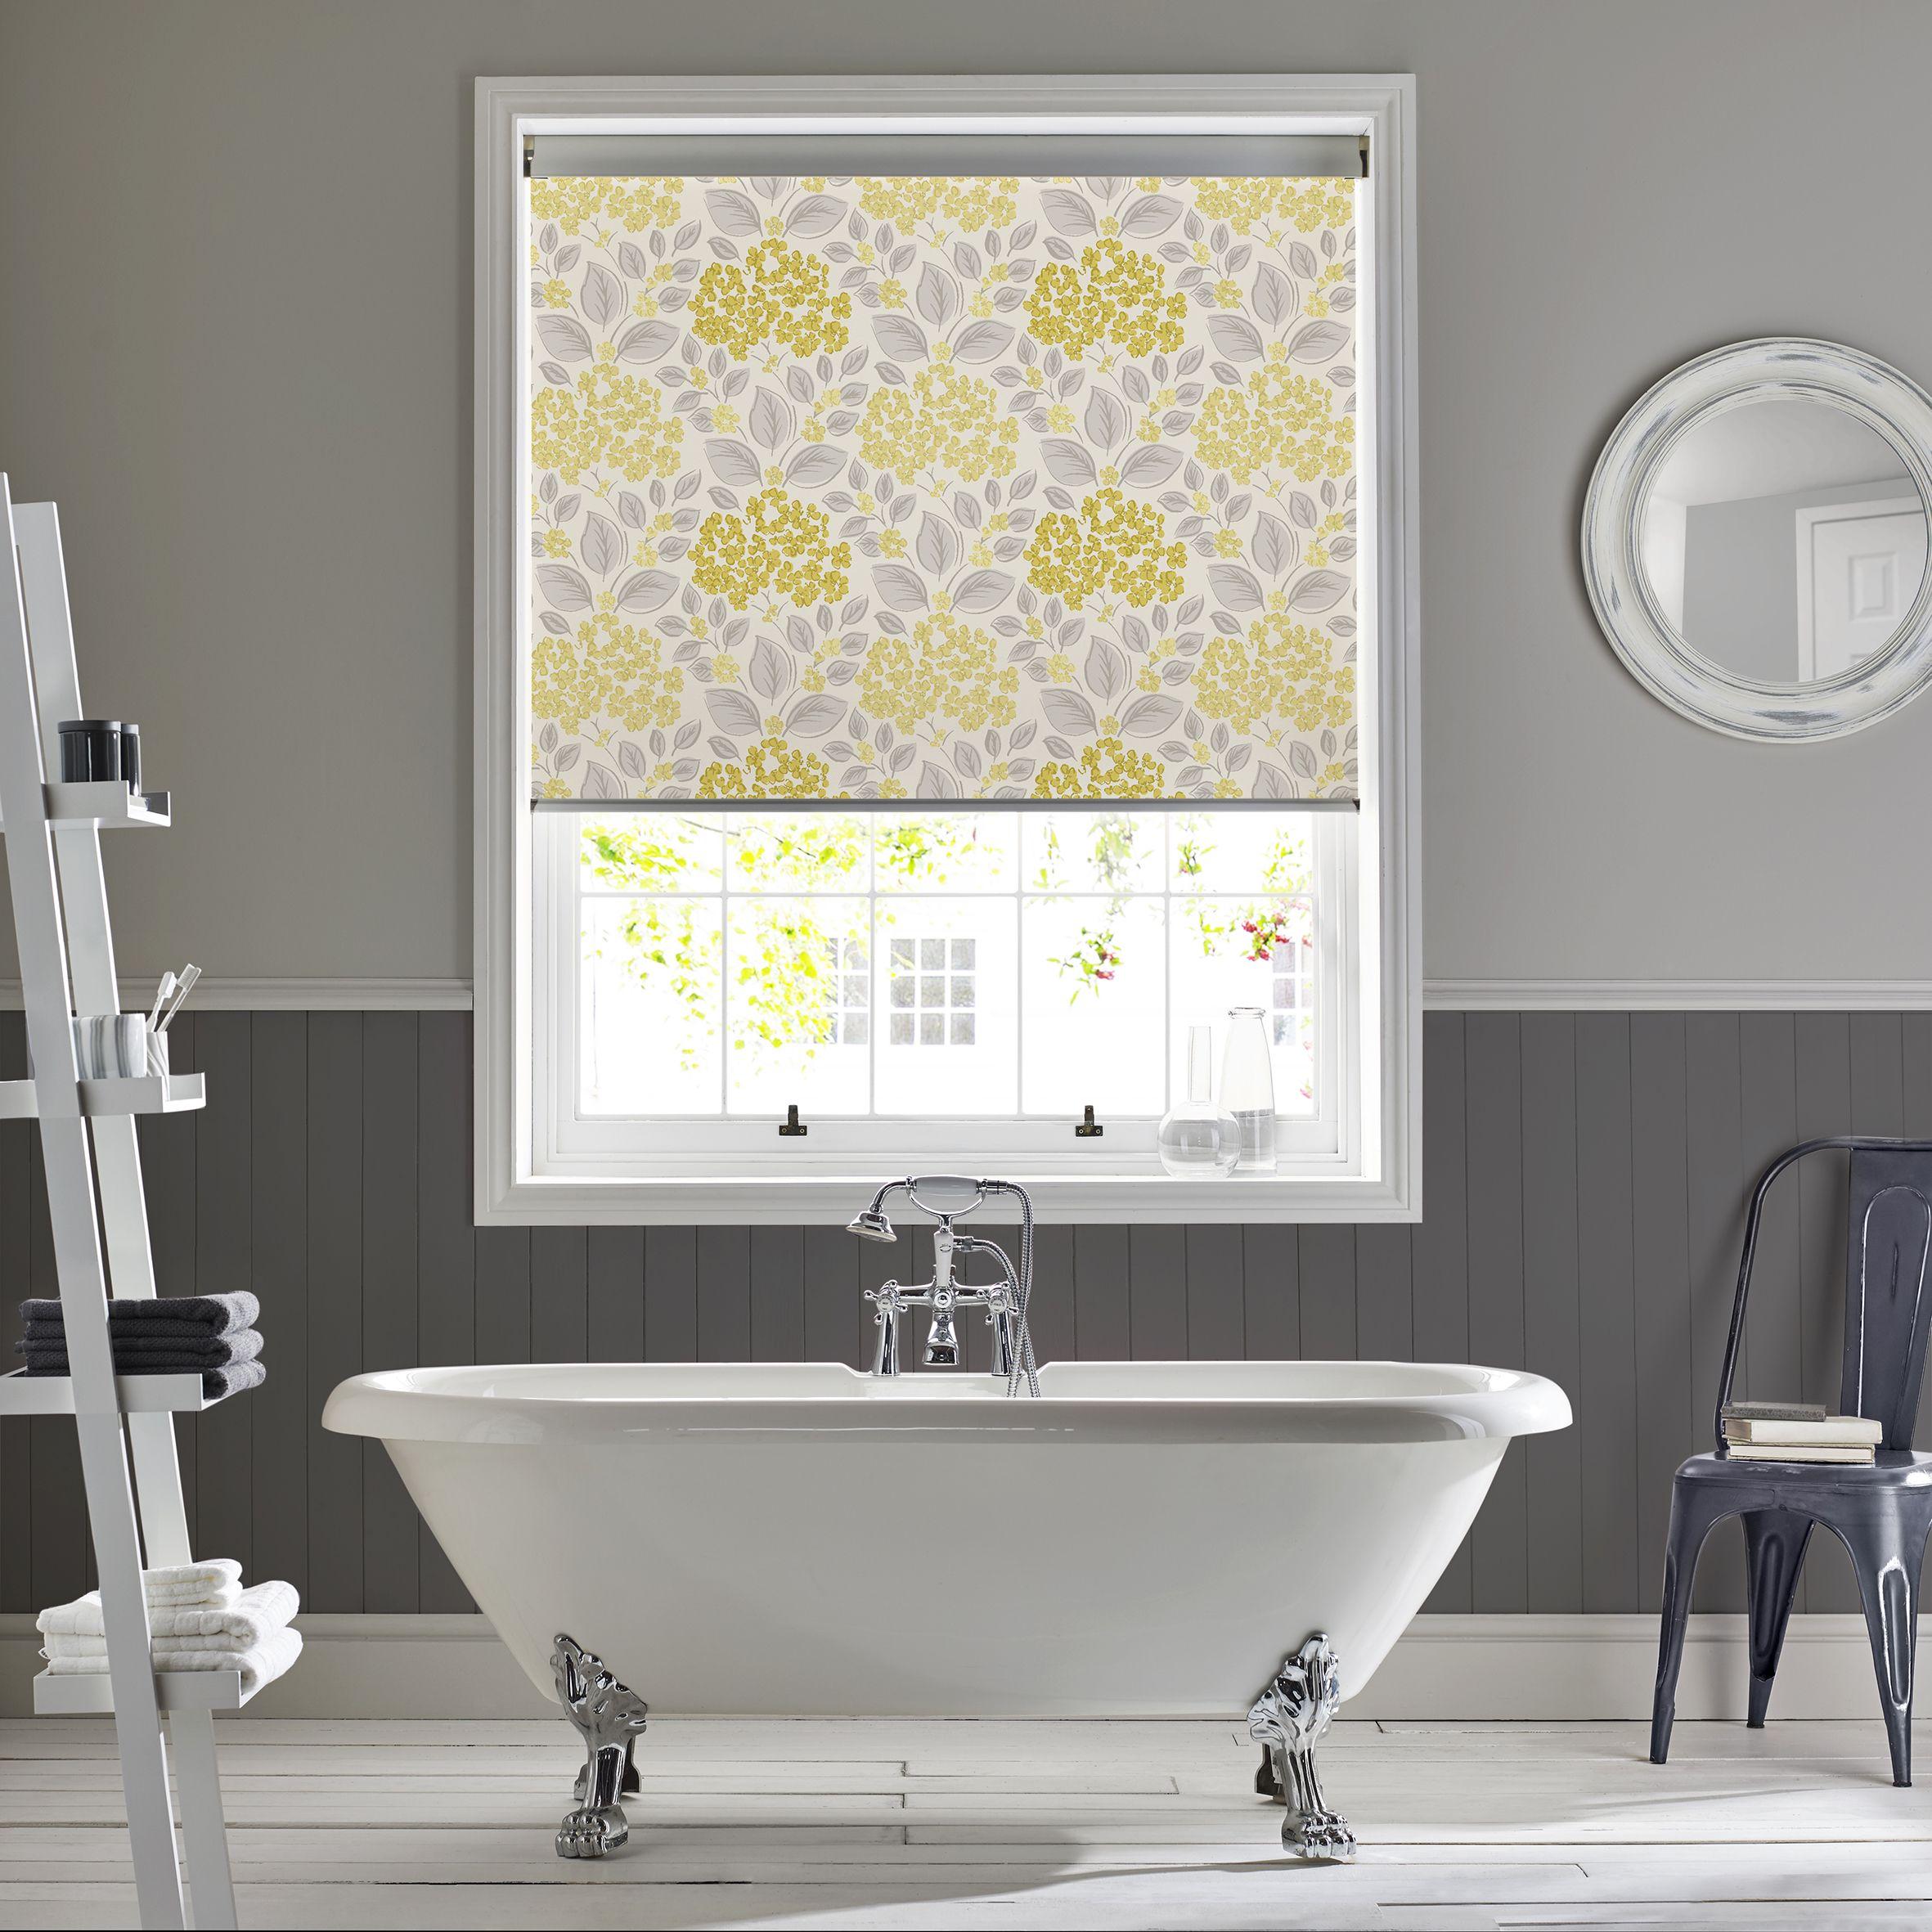 Hydrangea yellow roller blind by Style Studio